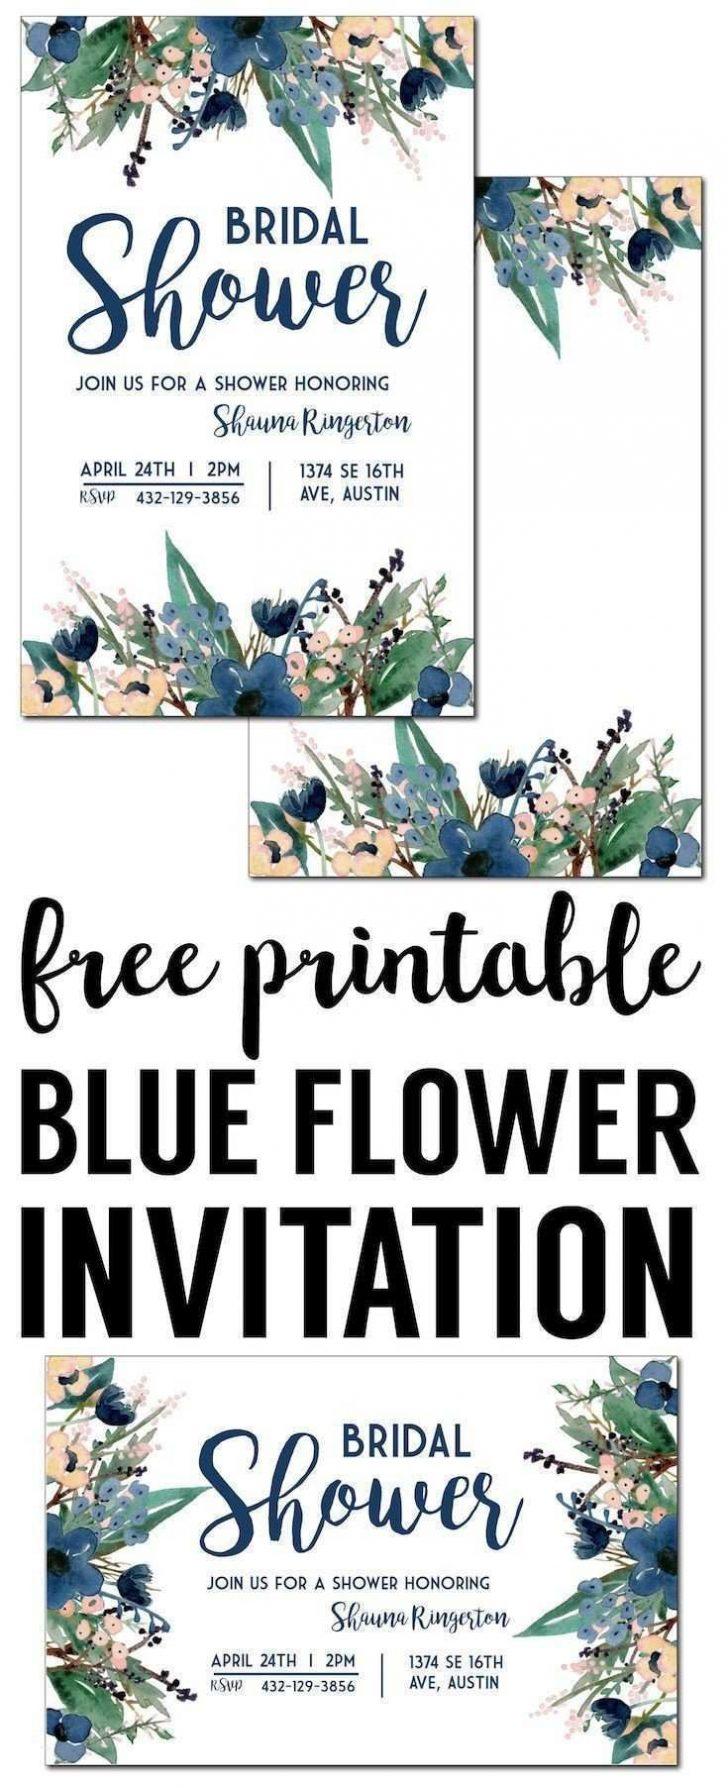 Reunion Invitation Ideas Beautiful Free Printable Family Reunion - Free Printable Family Reunion Invitations